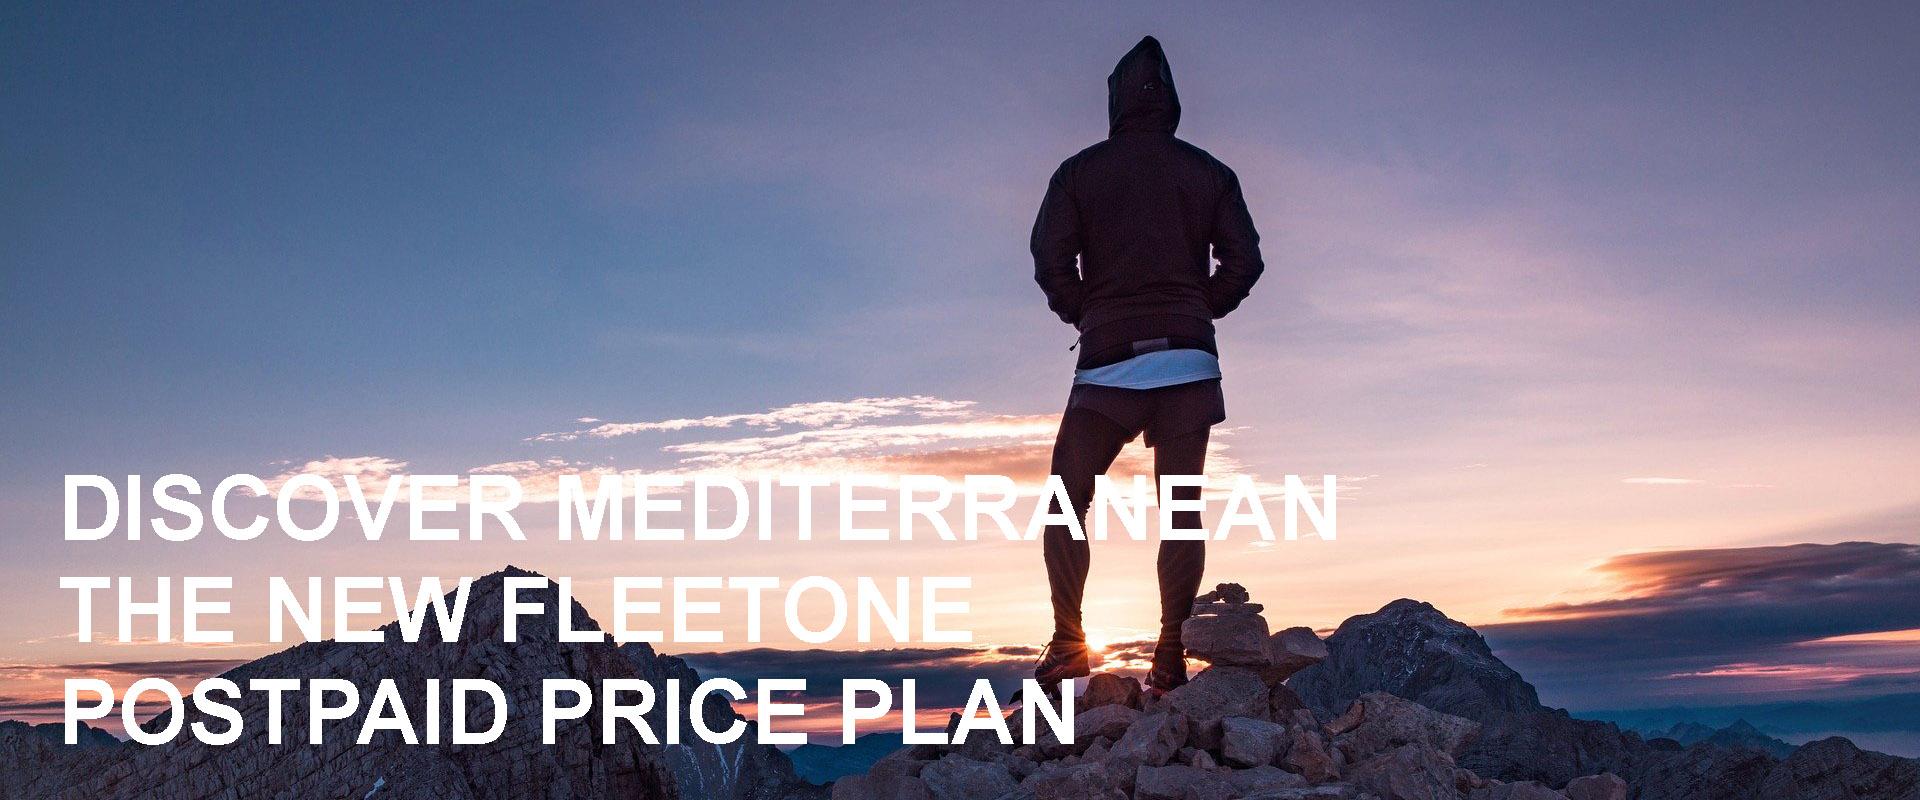 DISCOVER MEDITERRANEAN, THE NEW FLEETONE POSTPAID PRICE PLAN